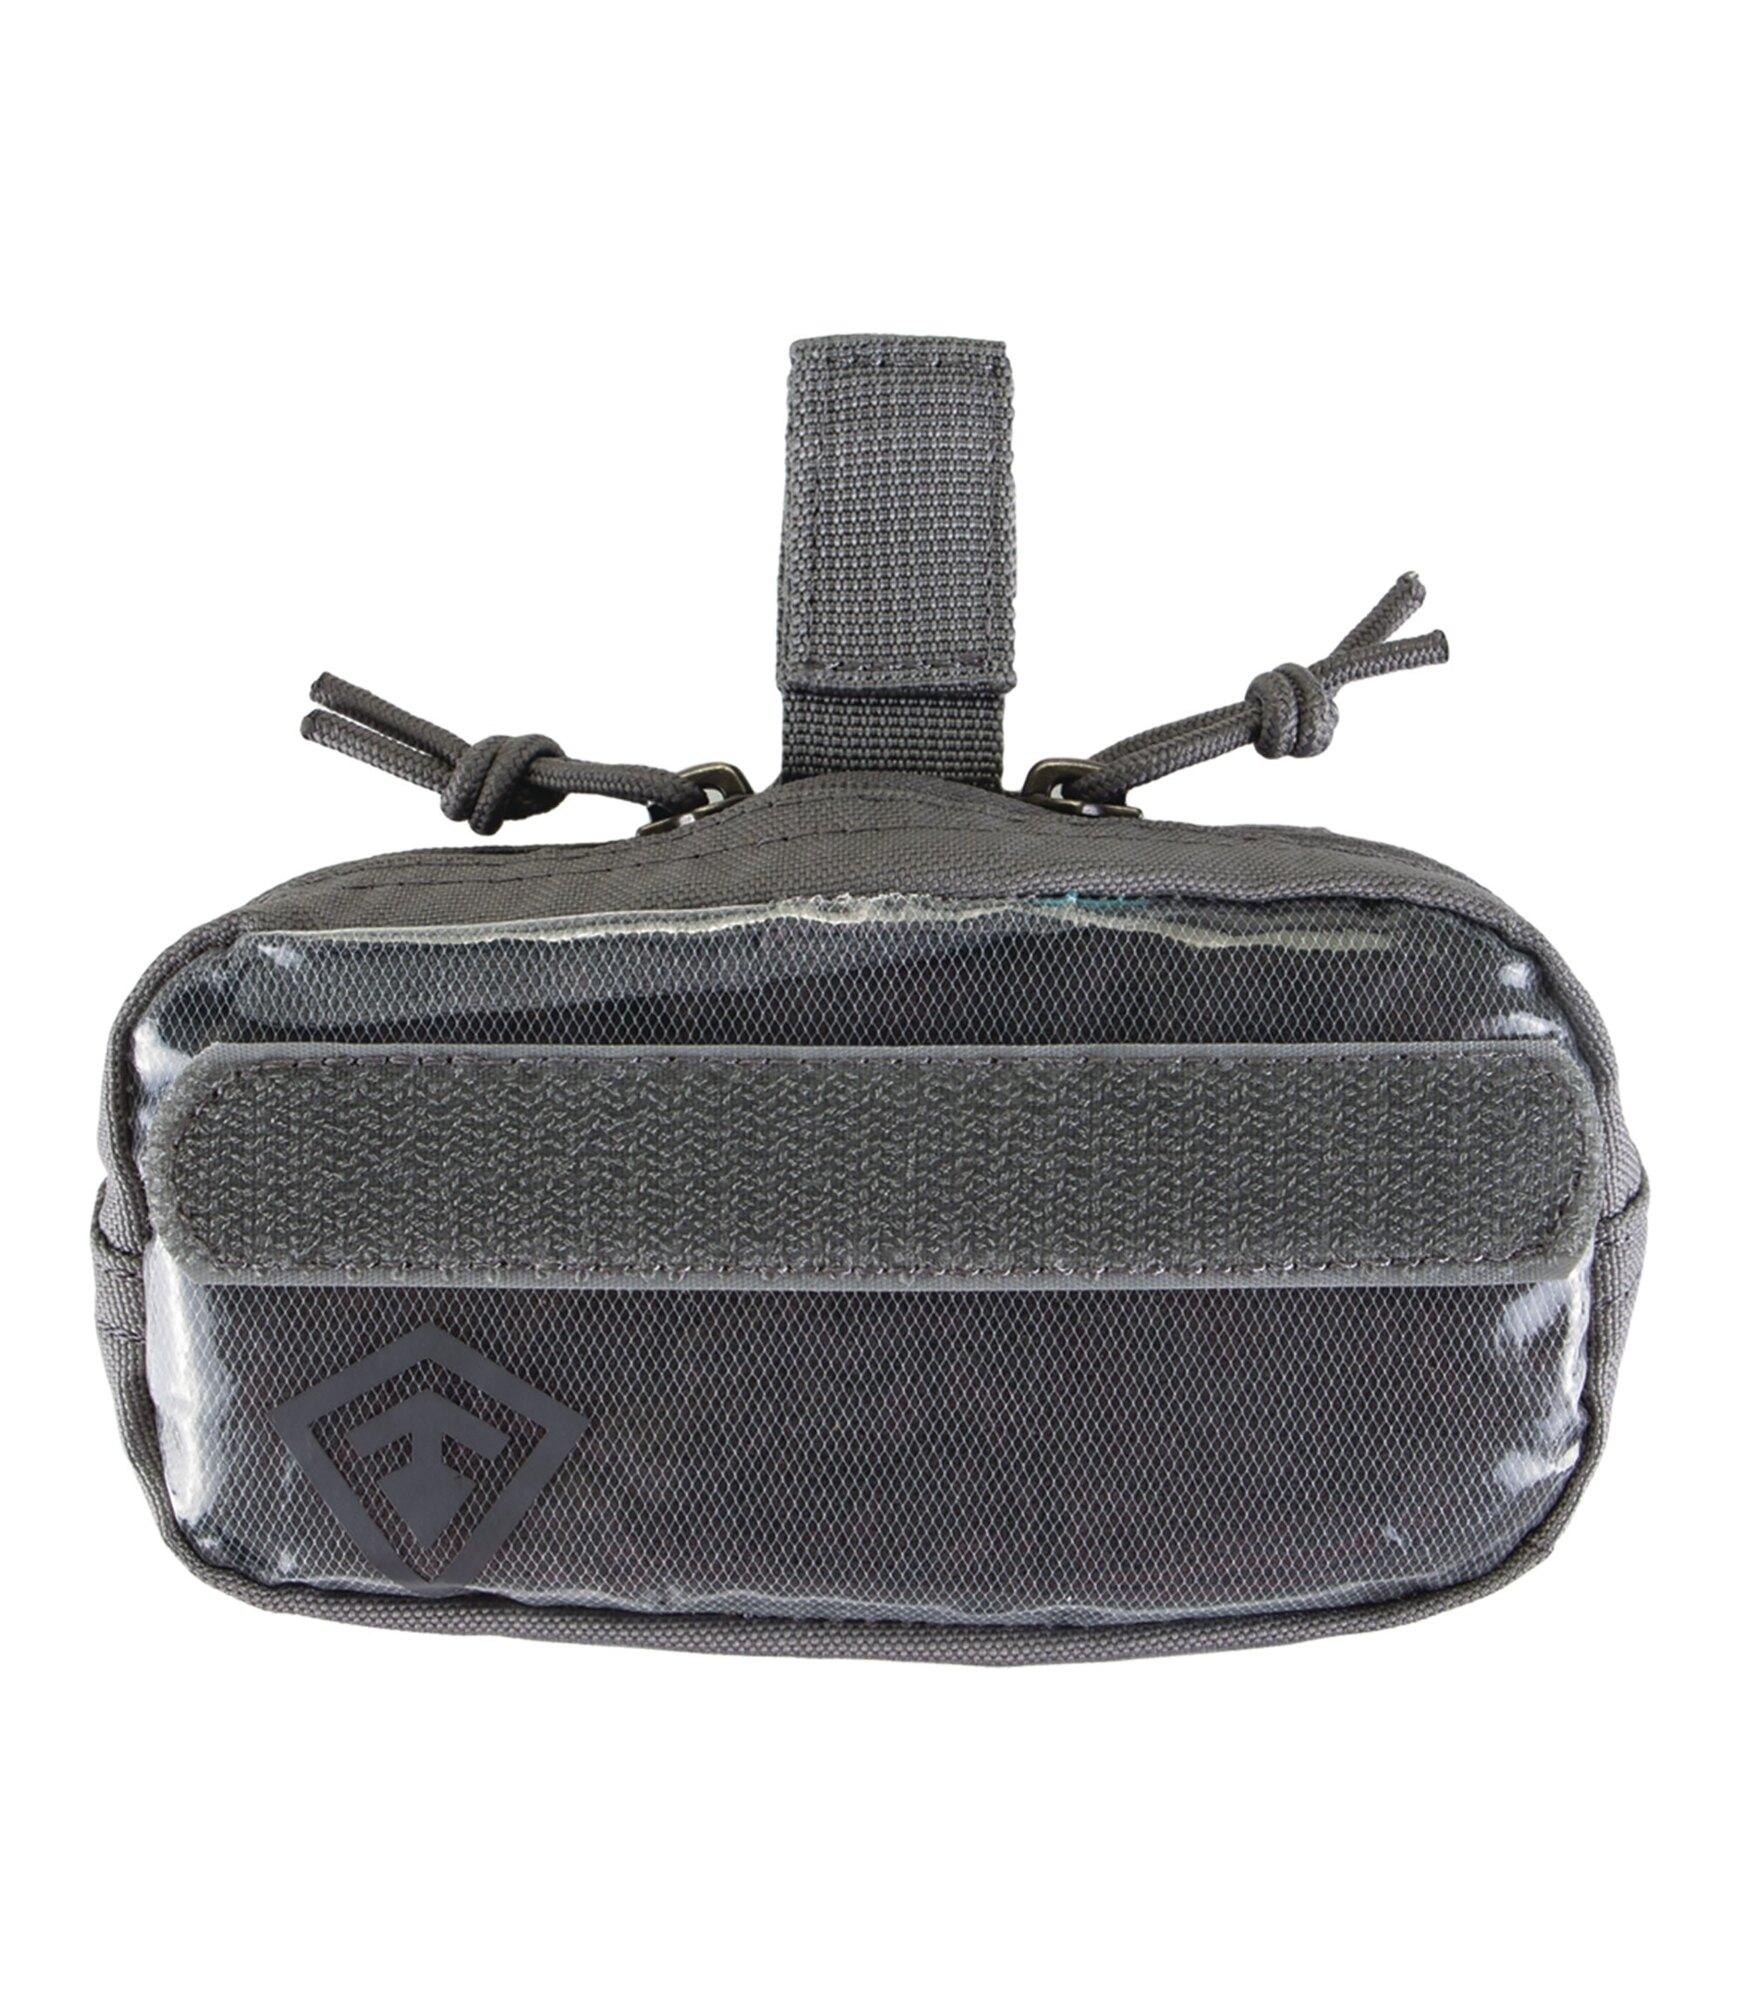 Puzdro Velcro 6x3 First Tactical® - sivé